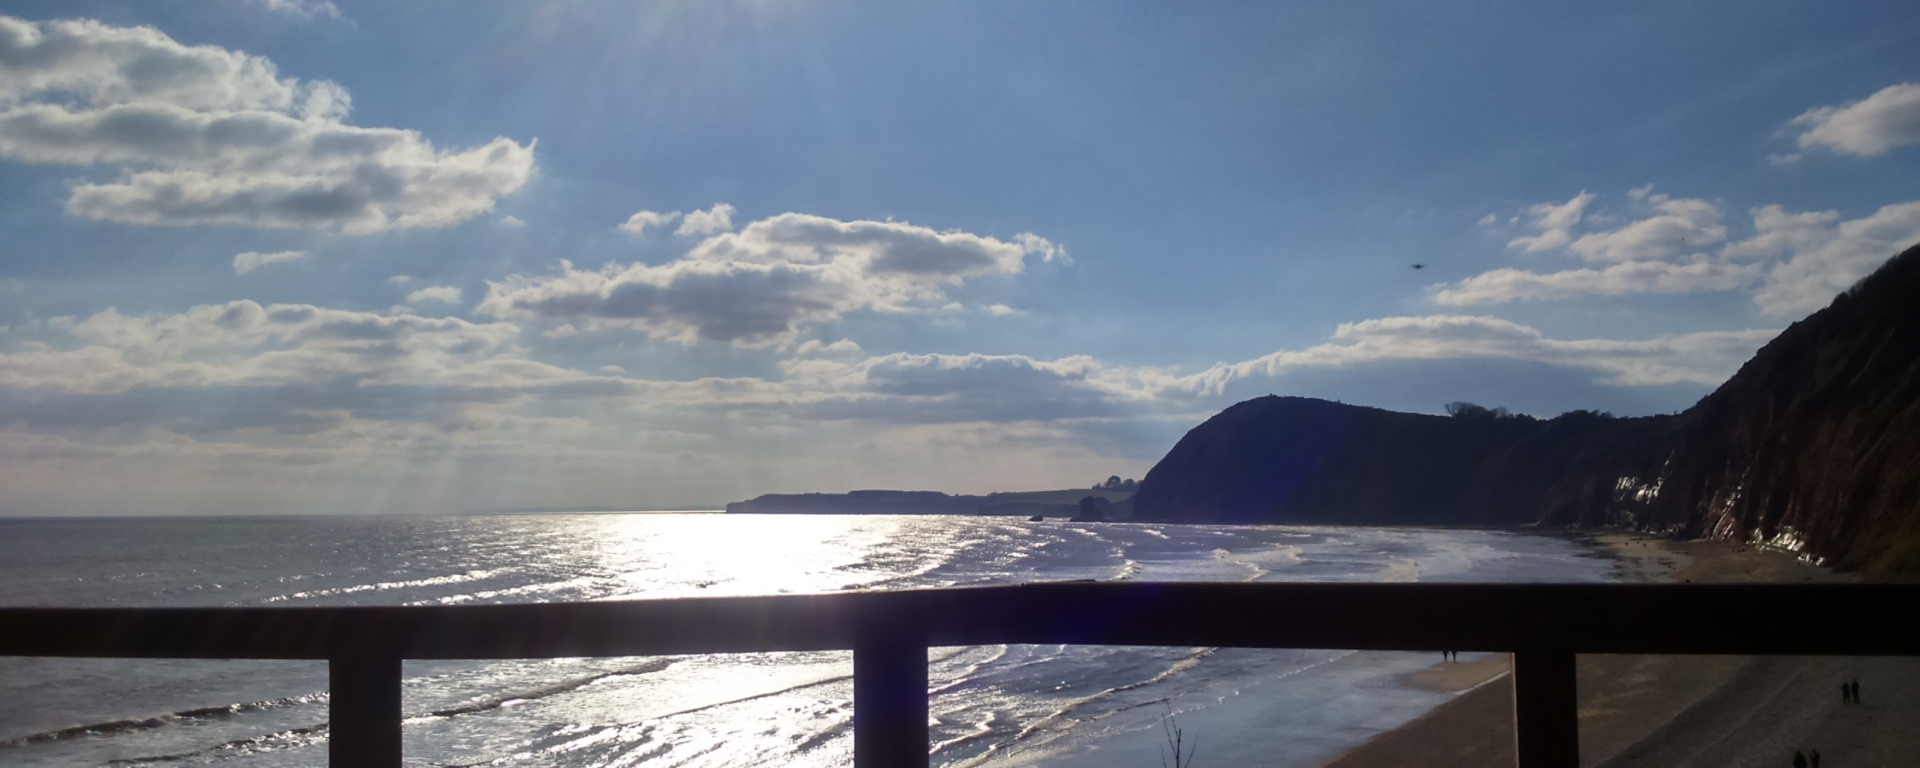 sidmouth sea view